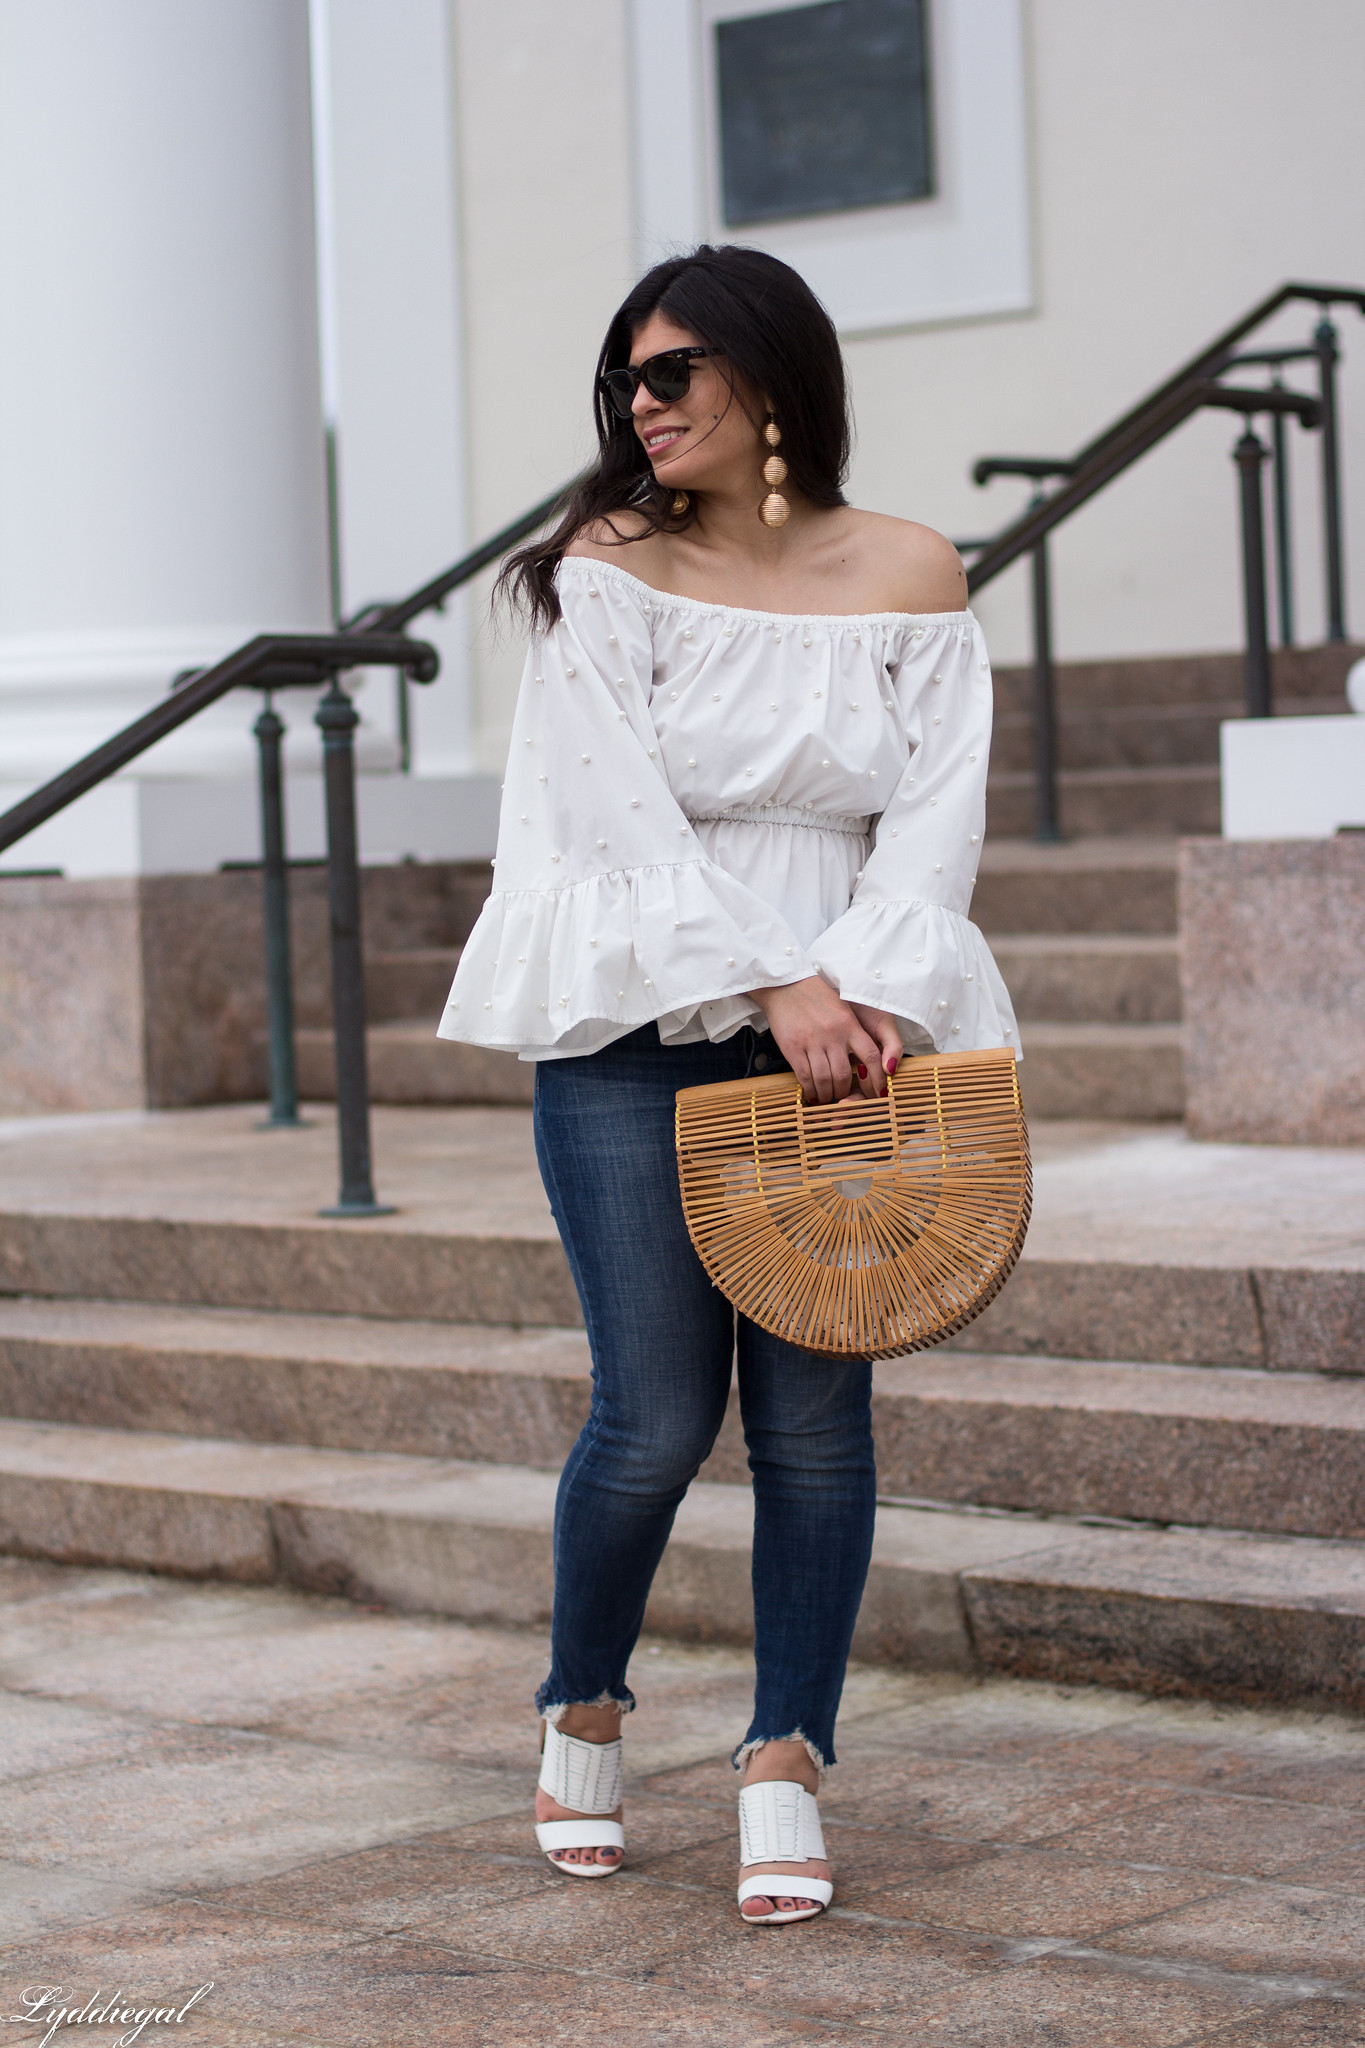 off the shoulder pearl embellished blouse, distressed denim, bamboo purse-1.jpg